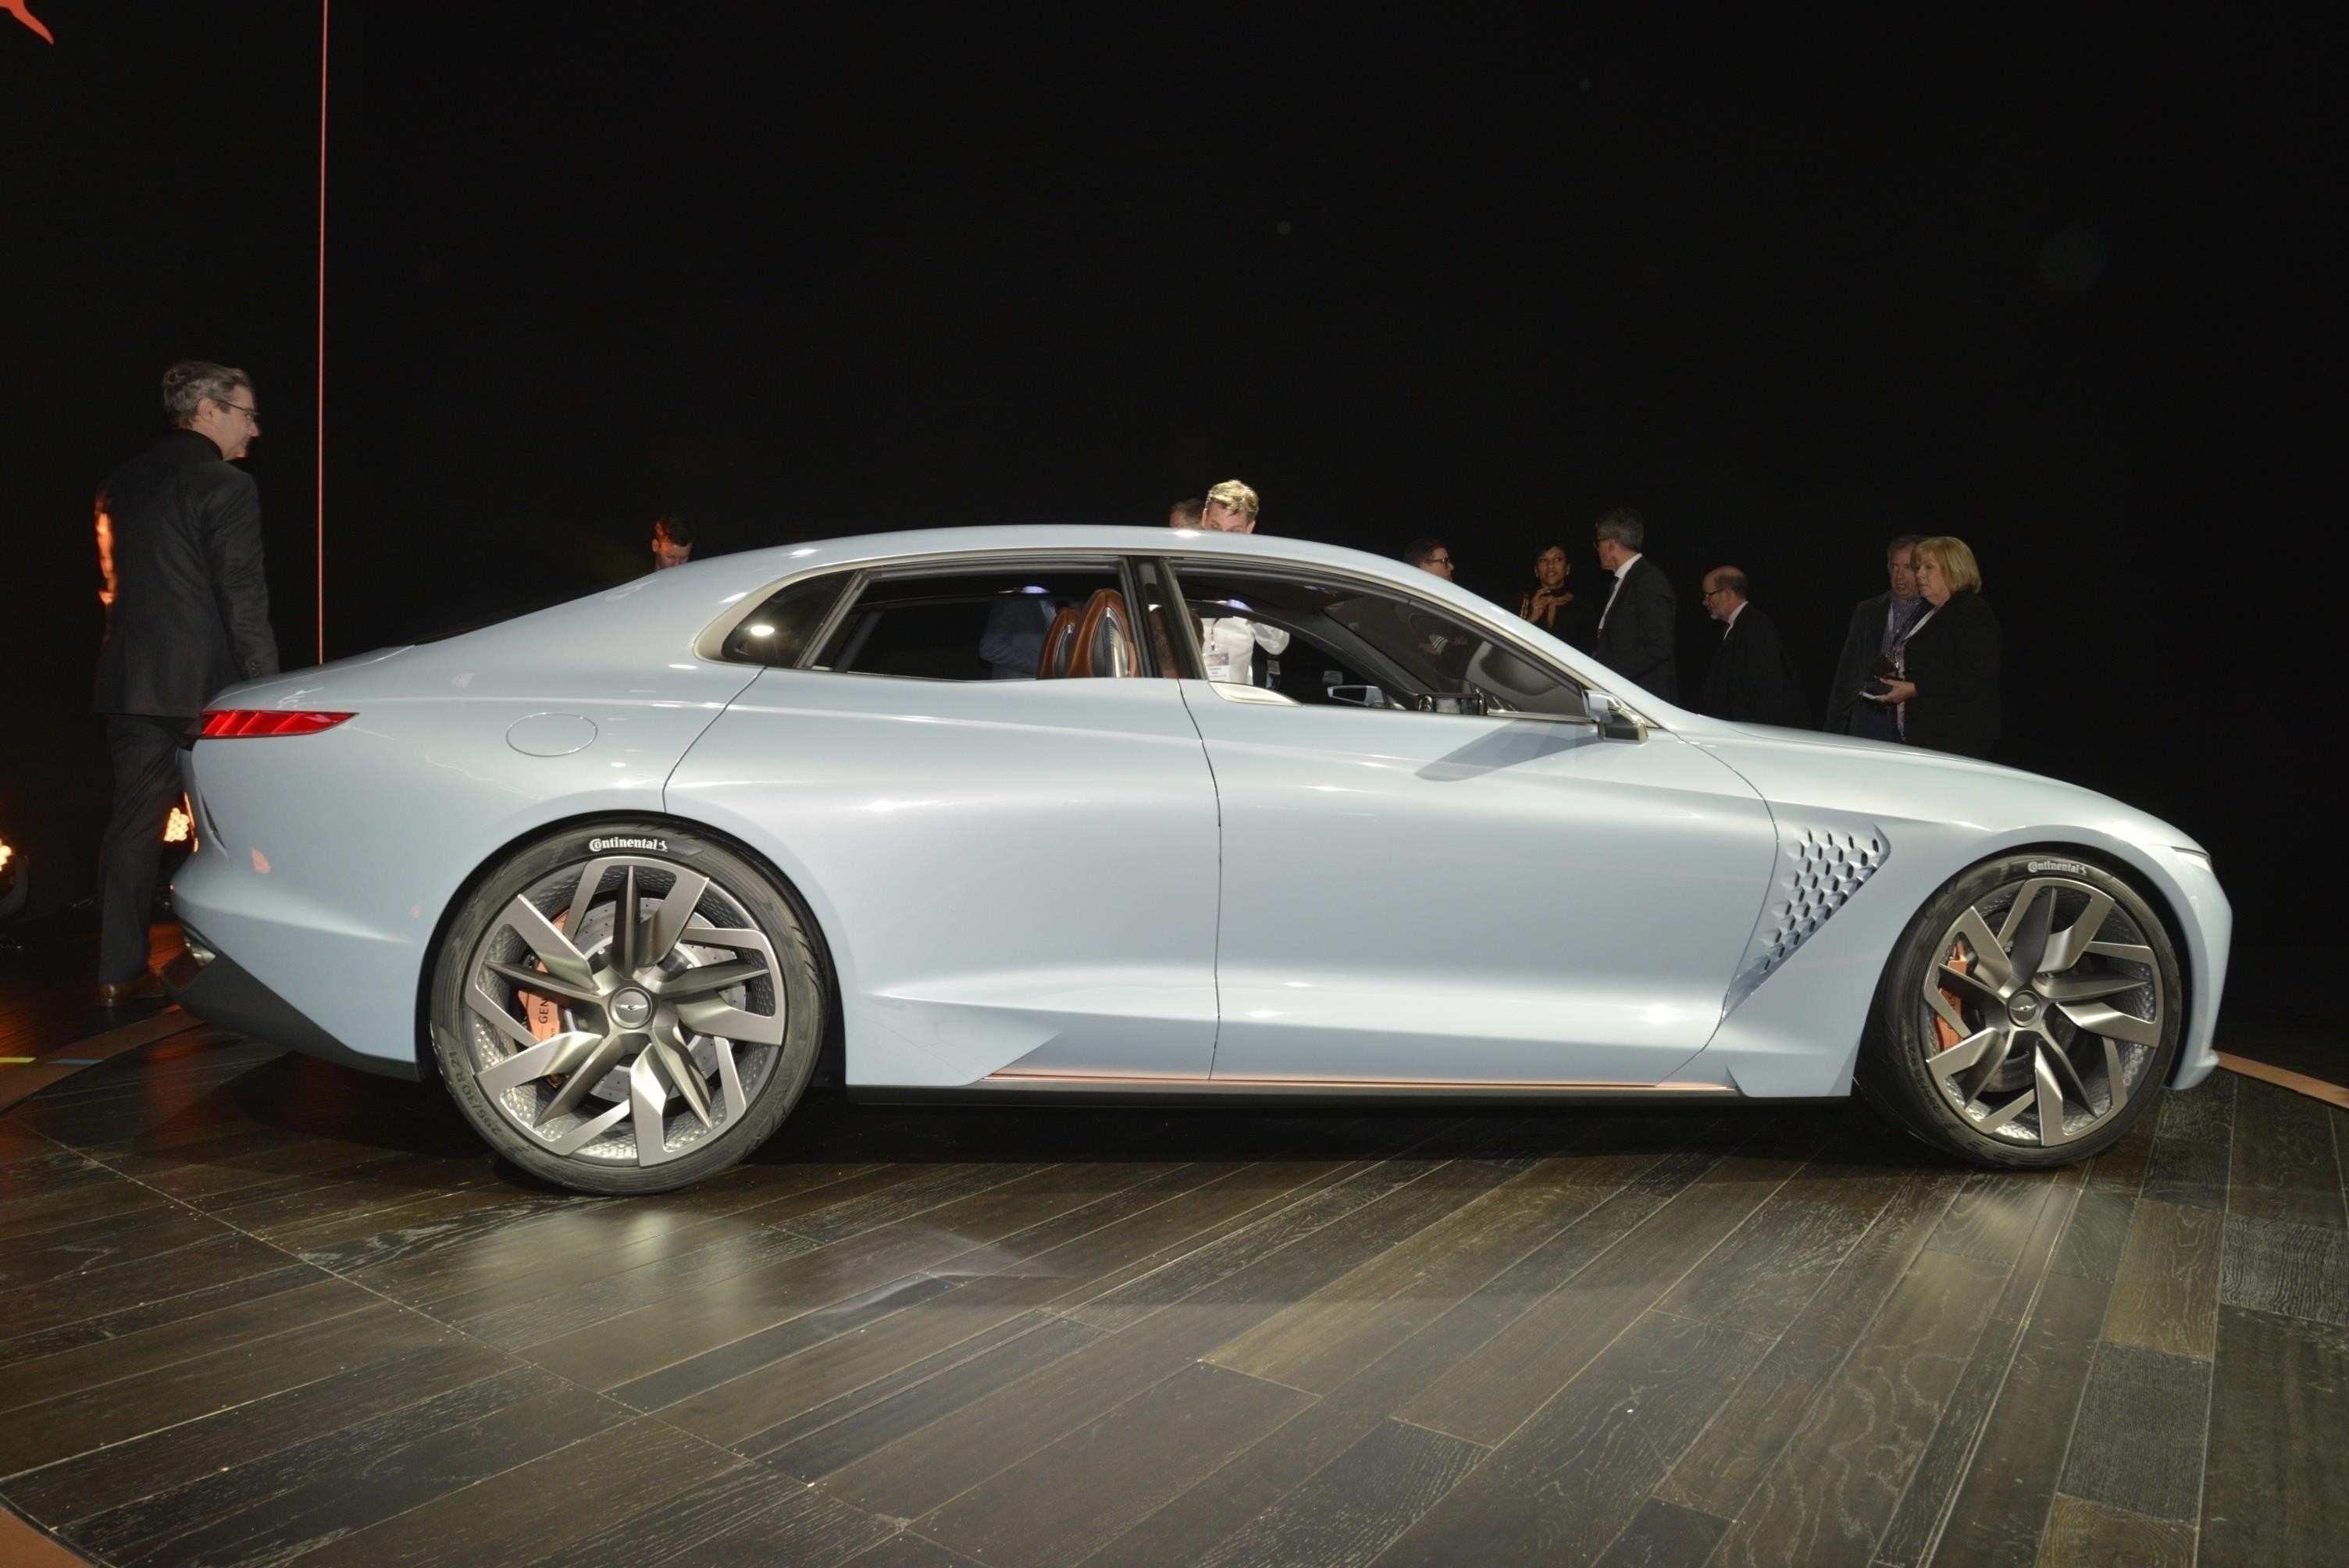 78 Best Review 2020 Hyundai Equus Style by 2020 Hyundai Equus